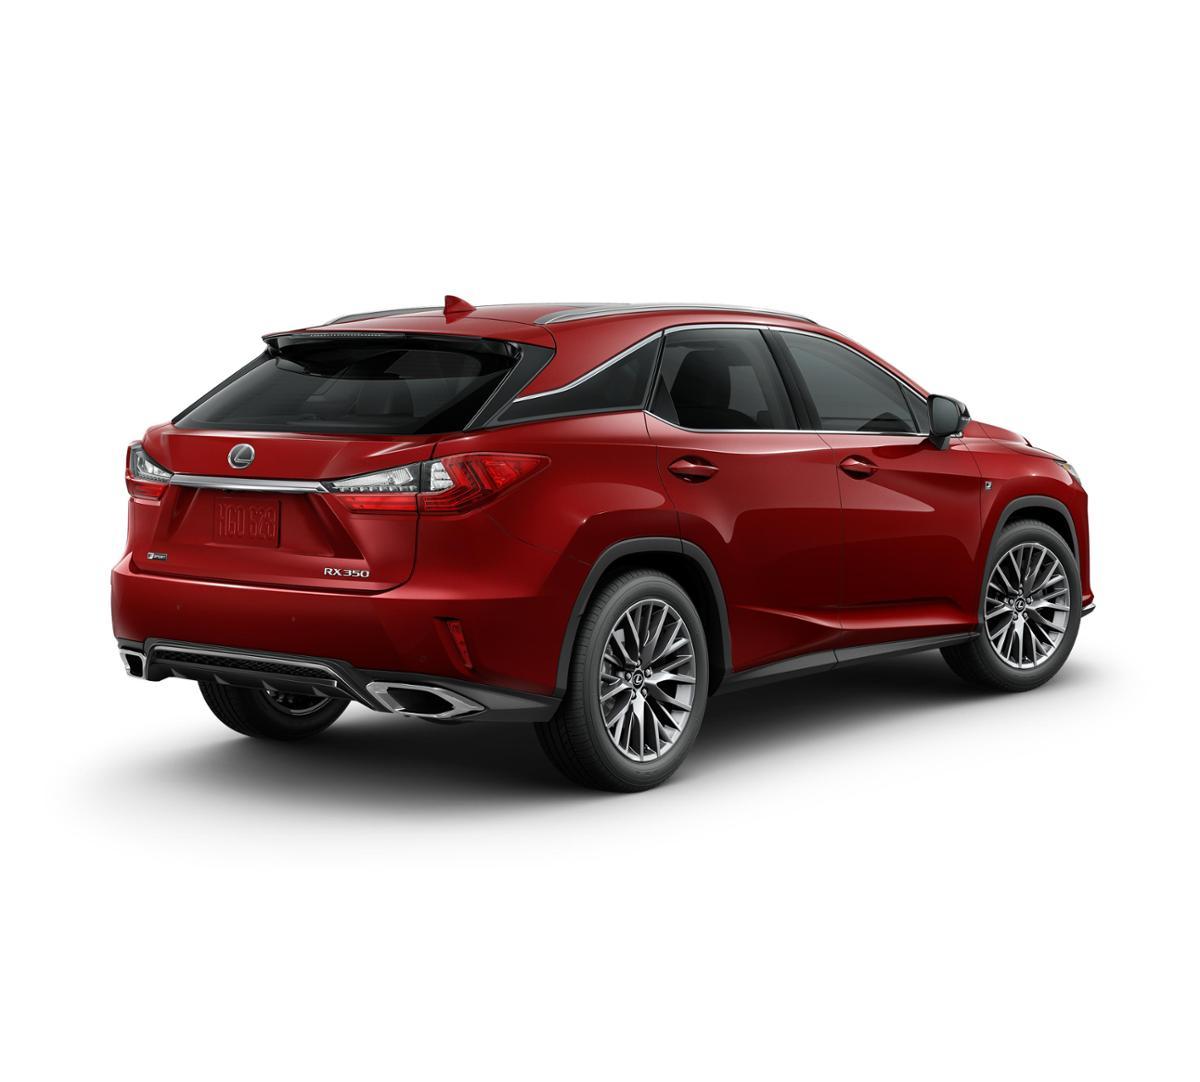 Cadillac Dealer Pembroke Pines: New 2018 Lexus RX 350 For Sale In Escondido, CA